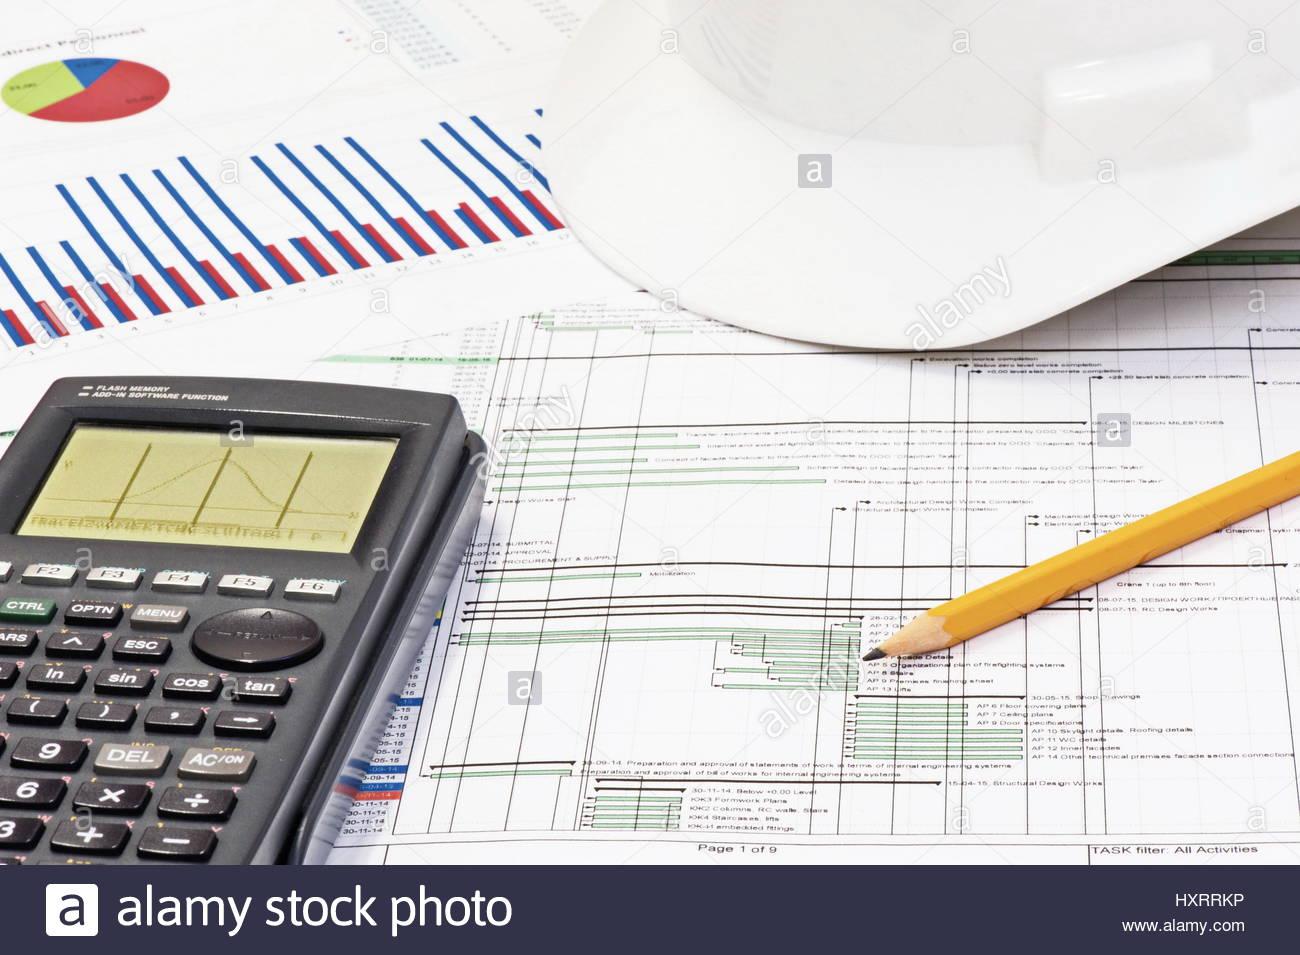 Analyzing construction progress program and calculating statistics analyzing construction progress program and calculating statistics using a scientific calculator ccuart Choice Image